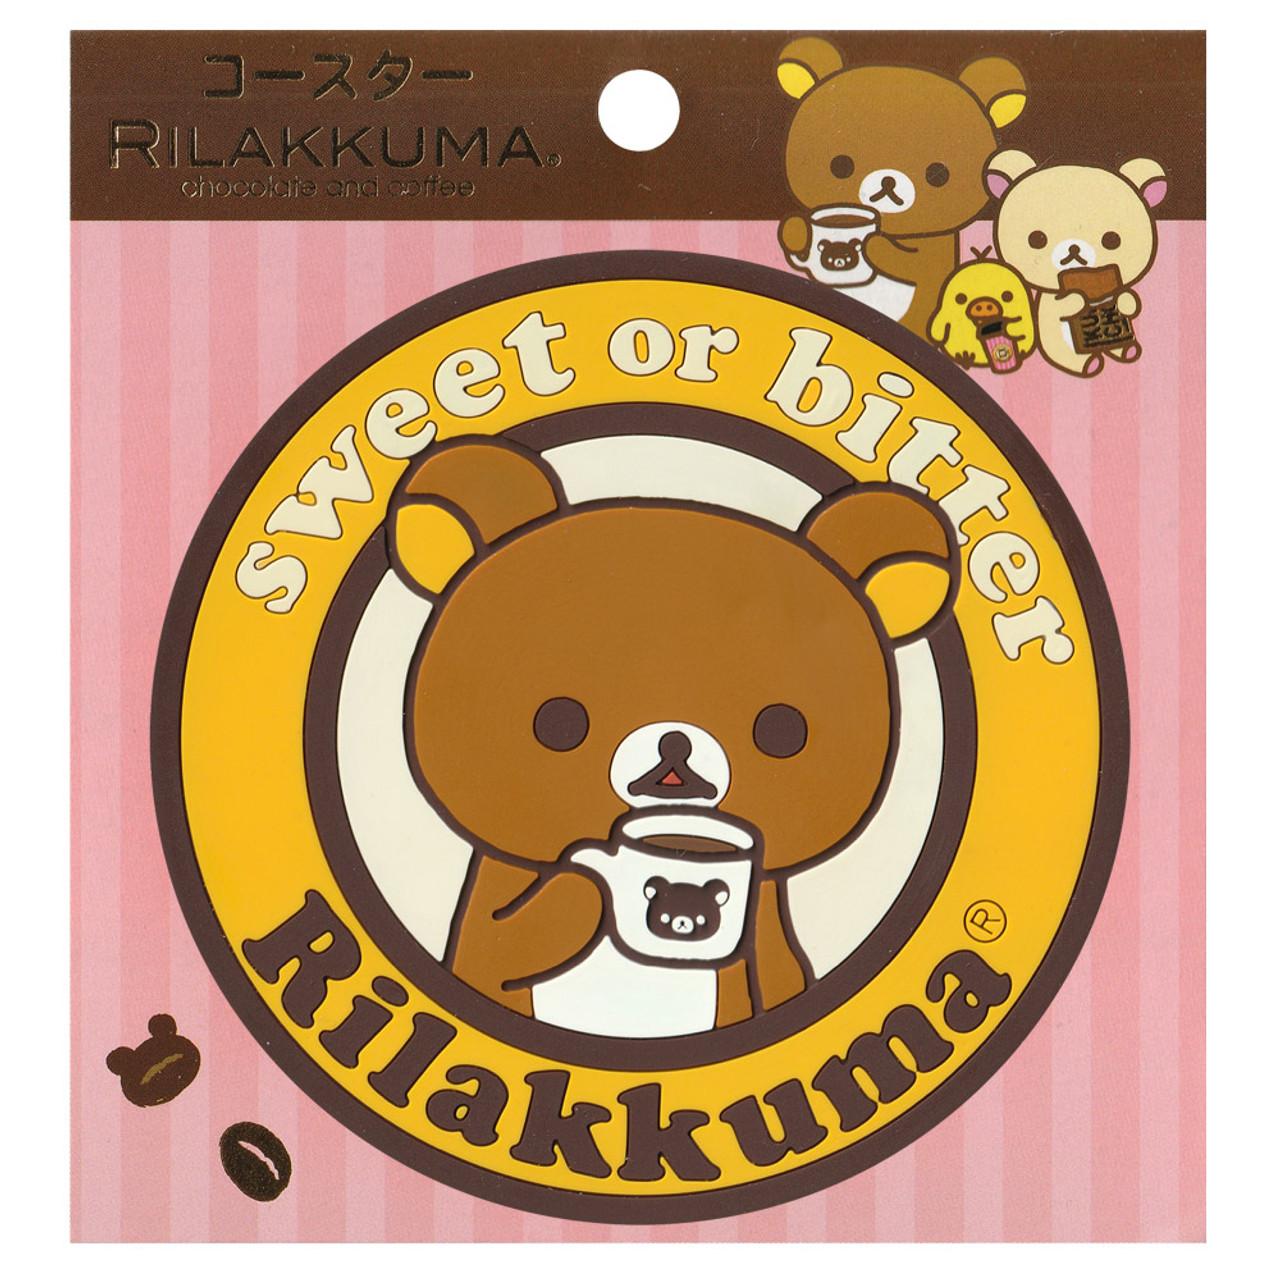 San-x Rilakkuma Circle Chocolate Coffee Mug Coaster - KY00901 ( Packing Front View )